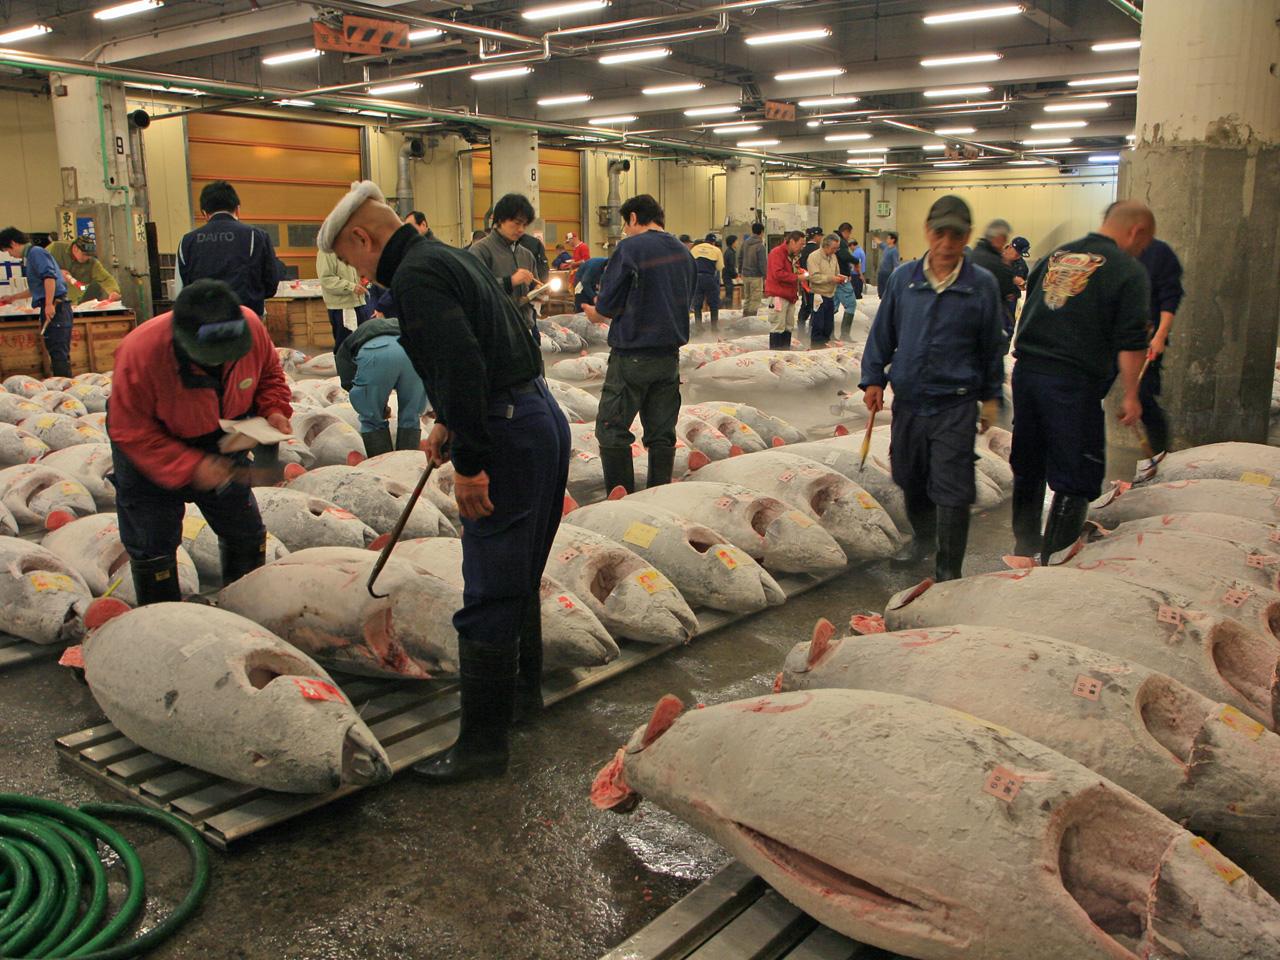 Tsukiji Fish Market, Things to do in Tokyo